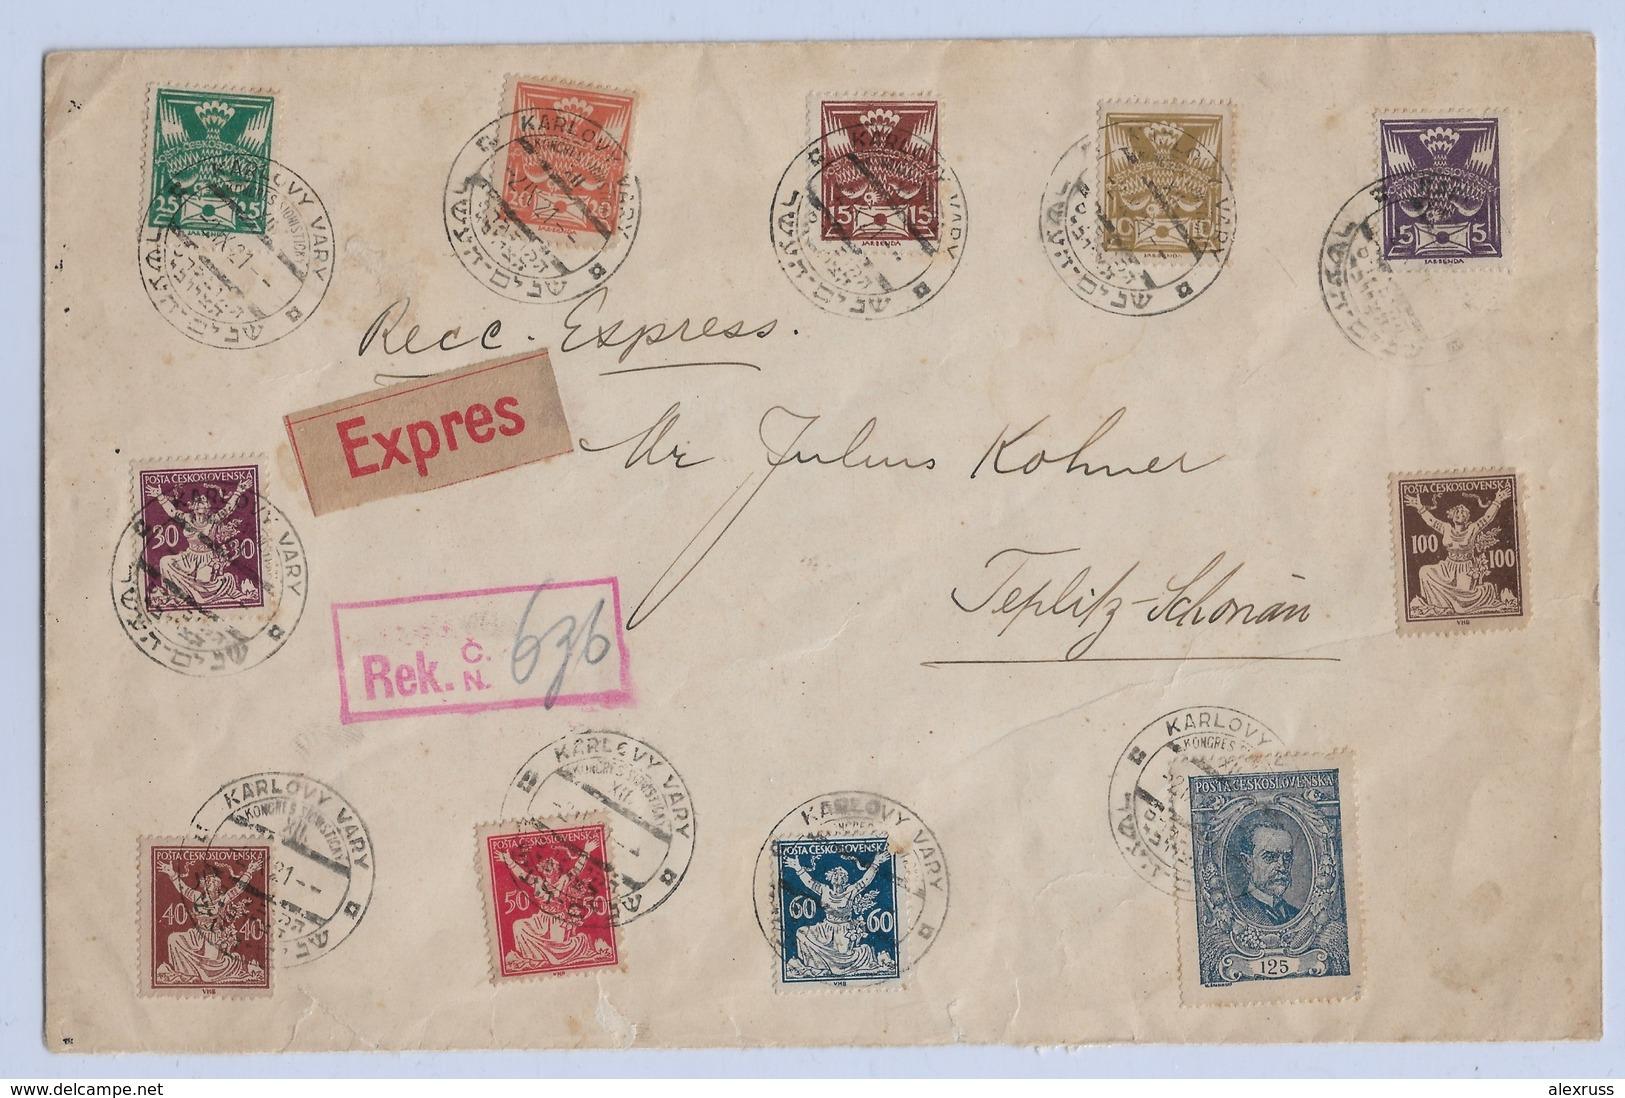 Czechoslovakia 1920-21,Rare Large Express Cover,VF Karlovy Vary Cancellation !! (RN-7 Folder) - Czechoslovakia